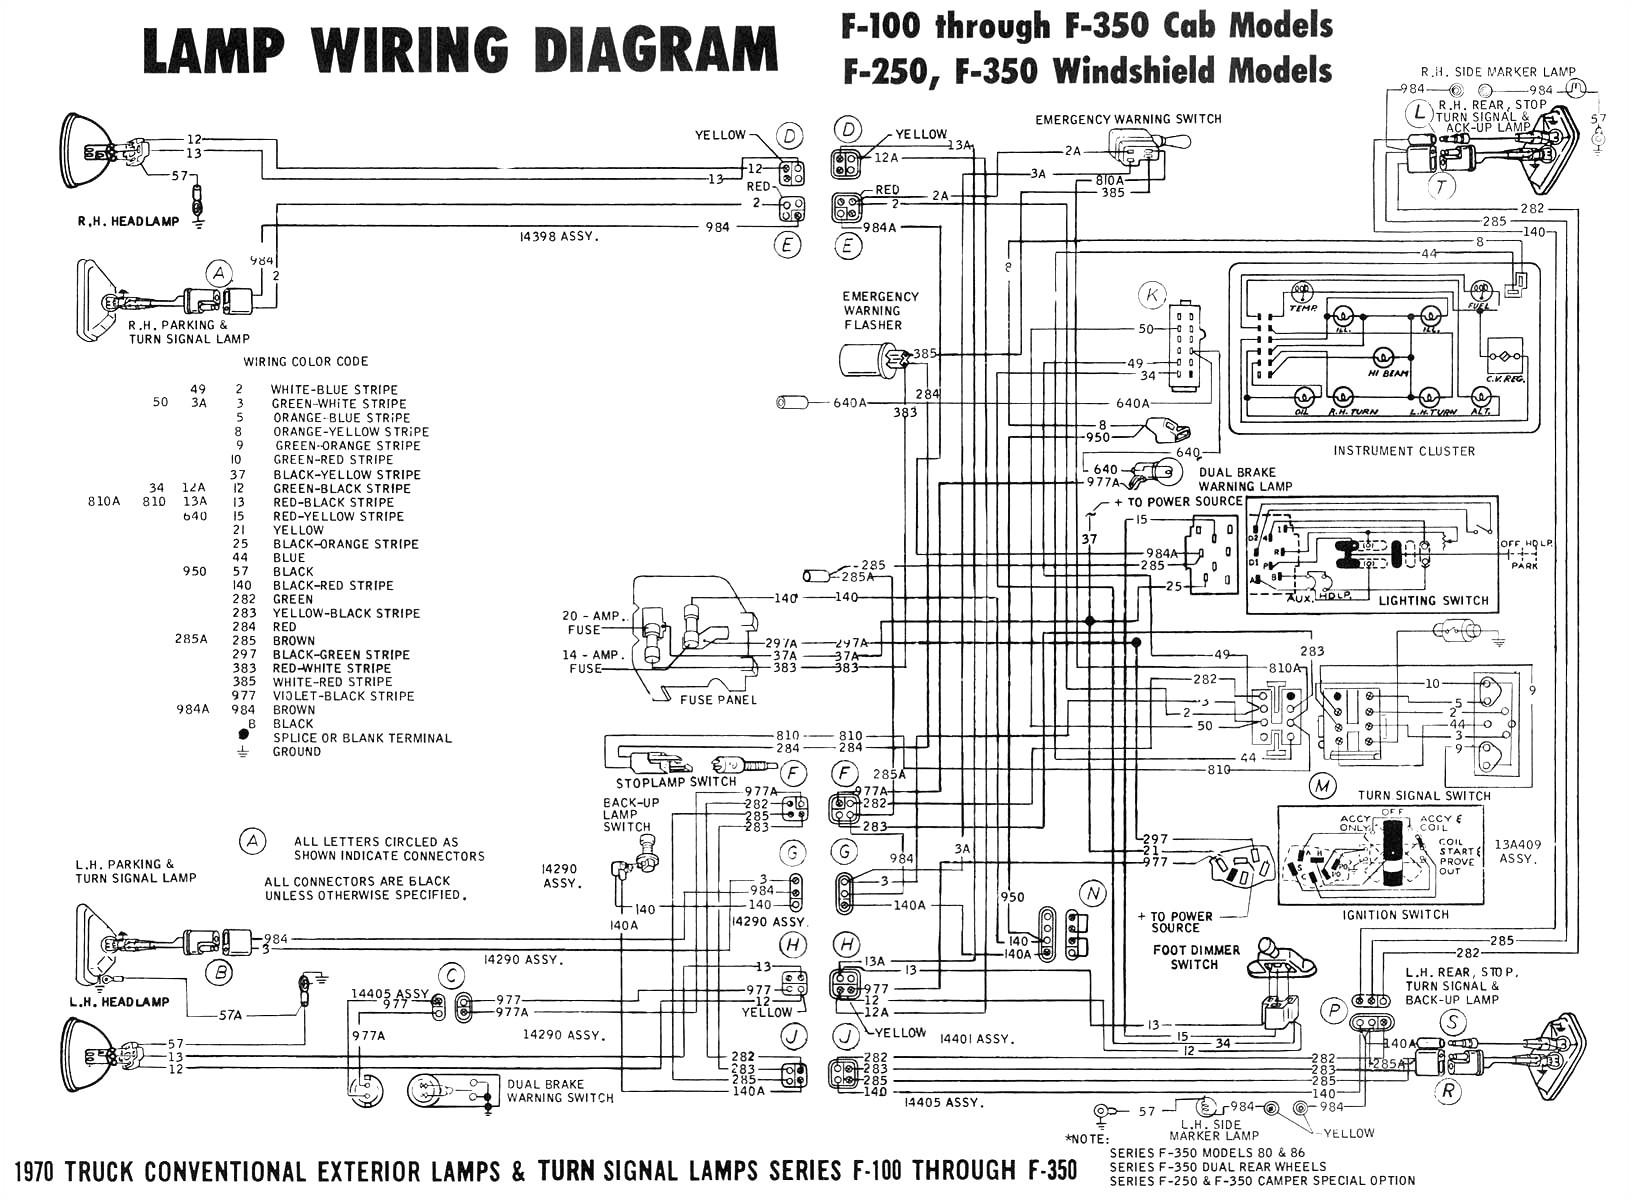 wiring diagram mitsubishi space wagon wiring diagrams data wiring diagrams and free manual ebooks 2010 chevrolet express